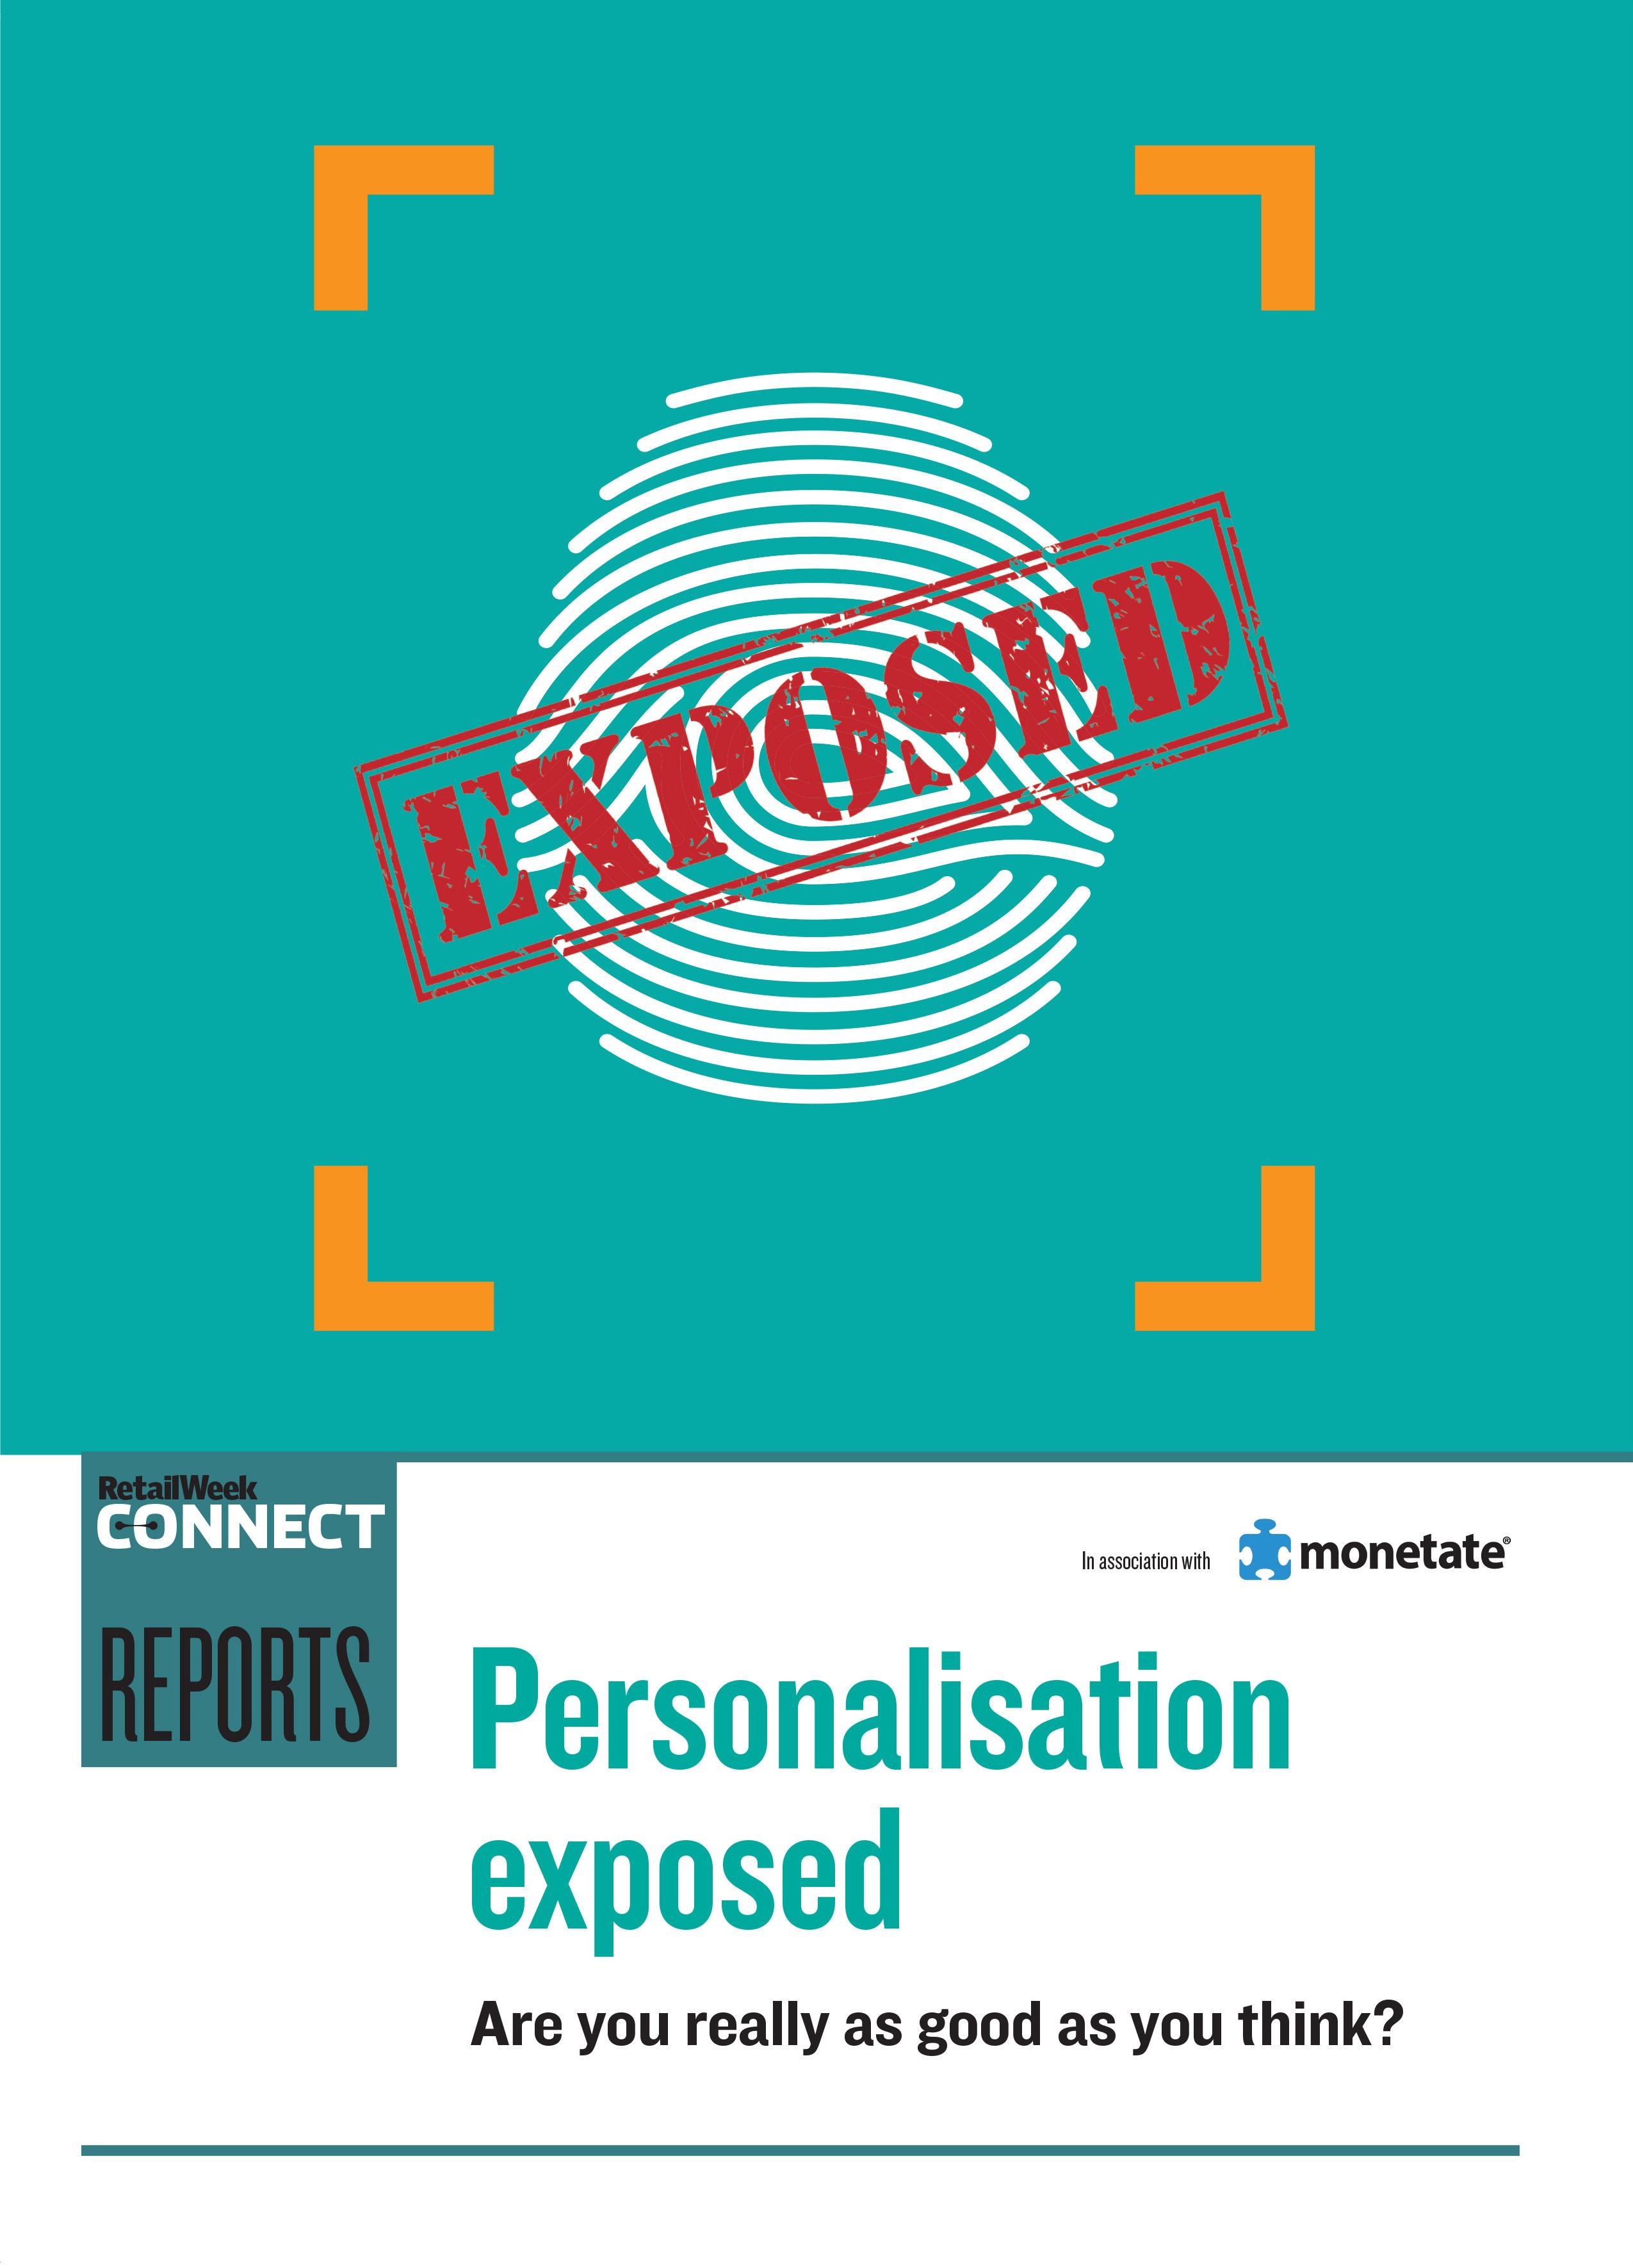 Monetate personalisation report